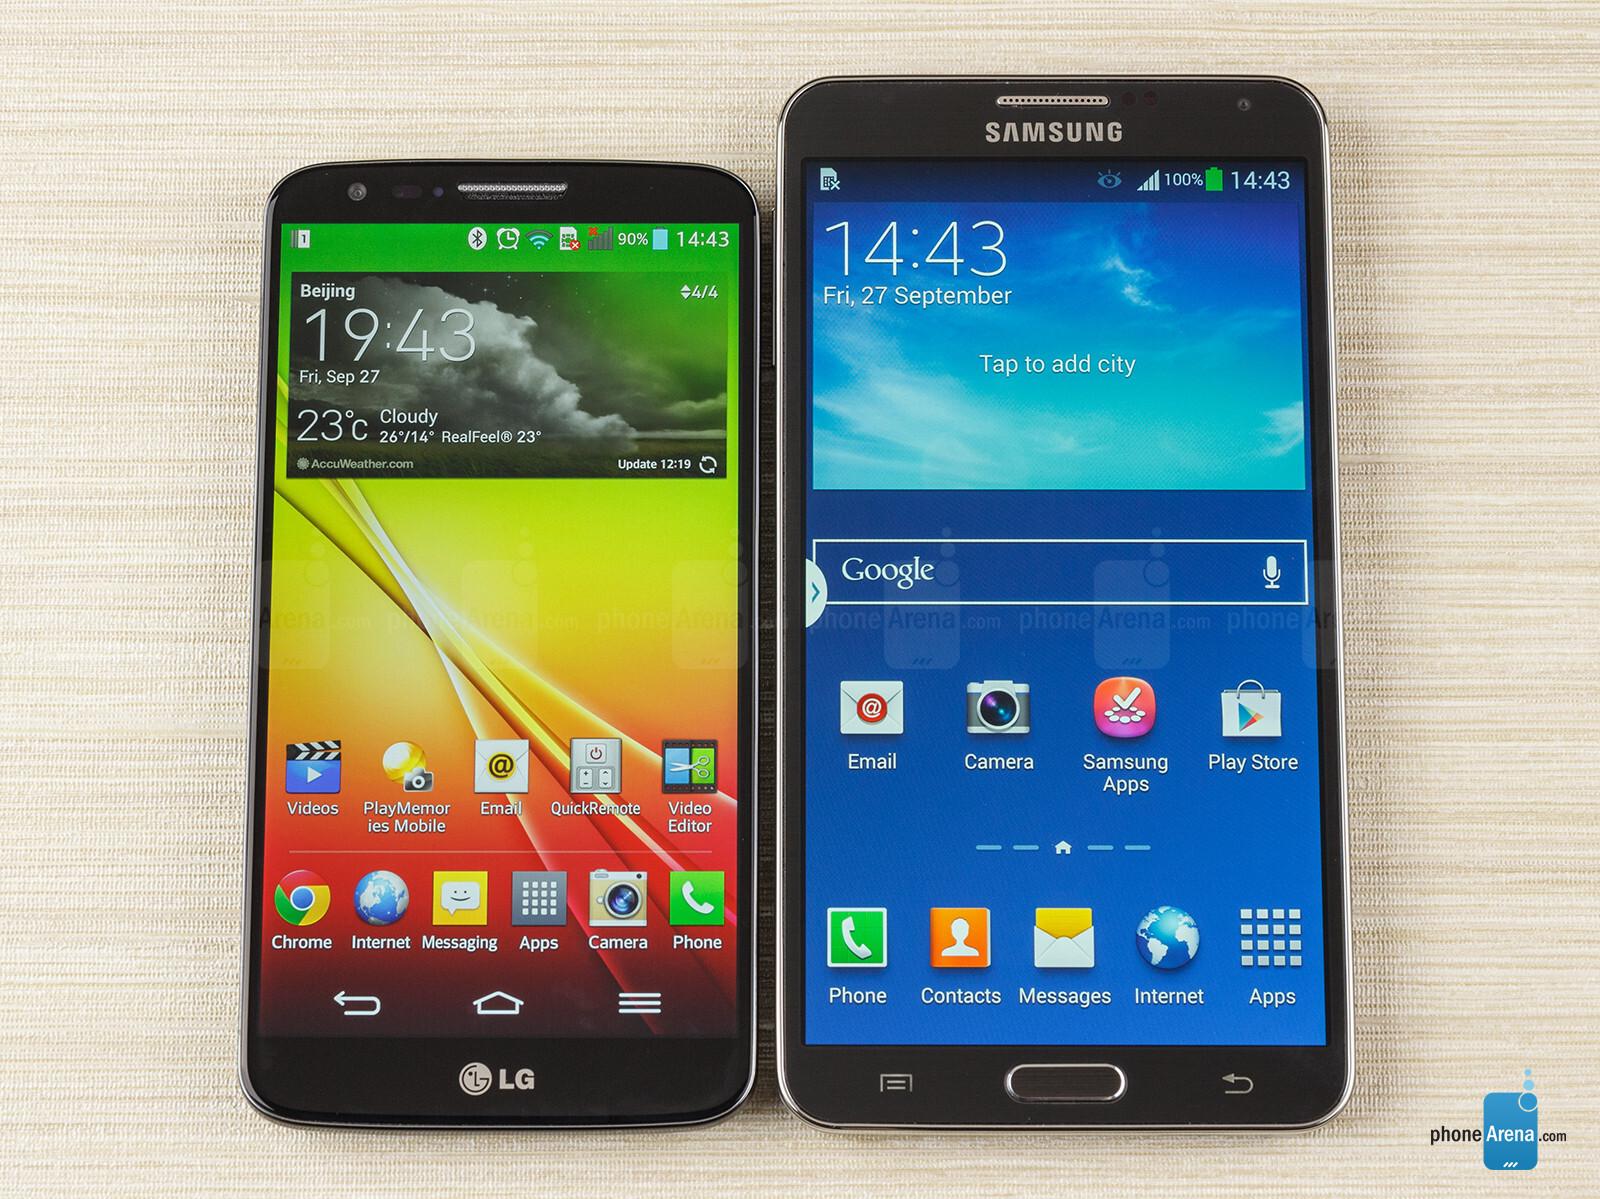 Lg g2 vs galaxy s3 camera